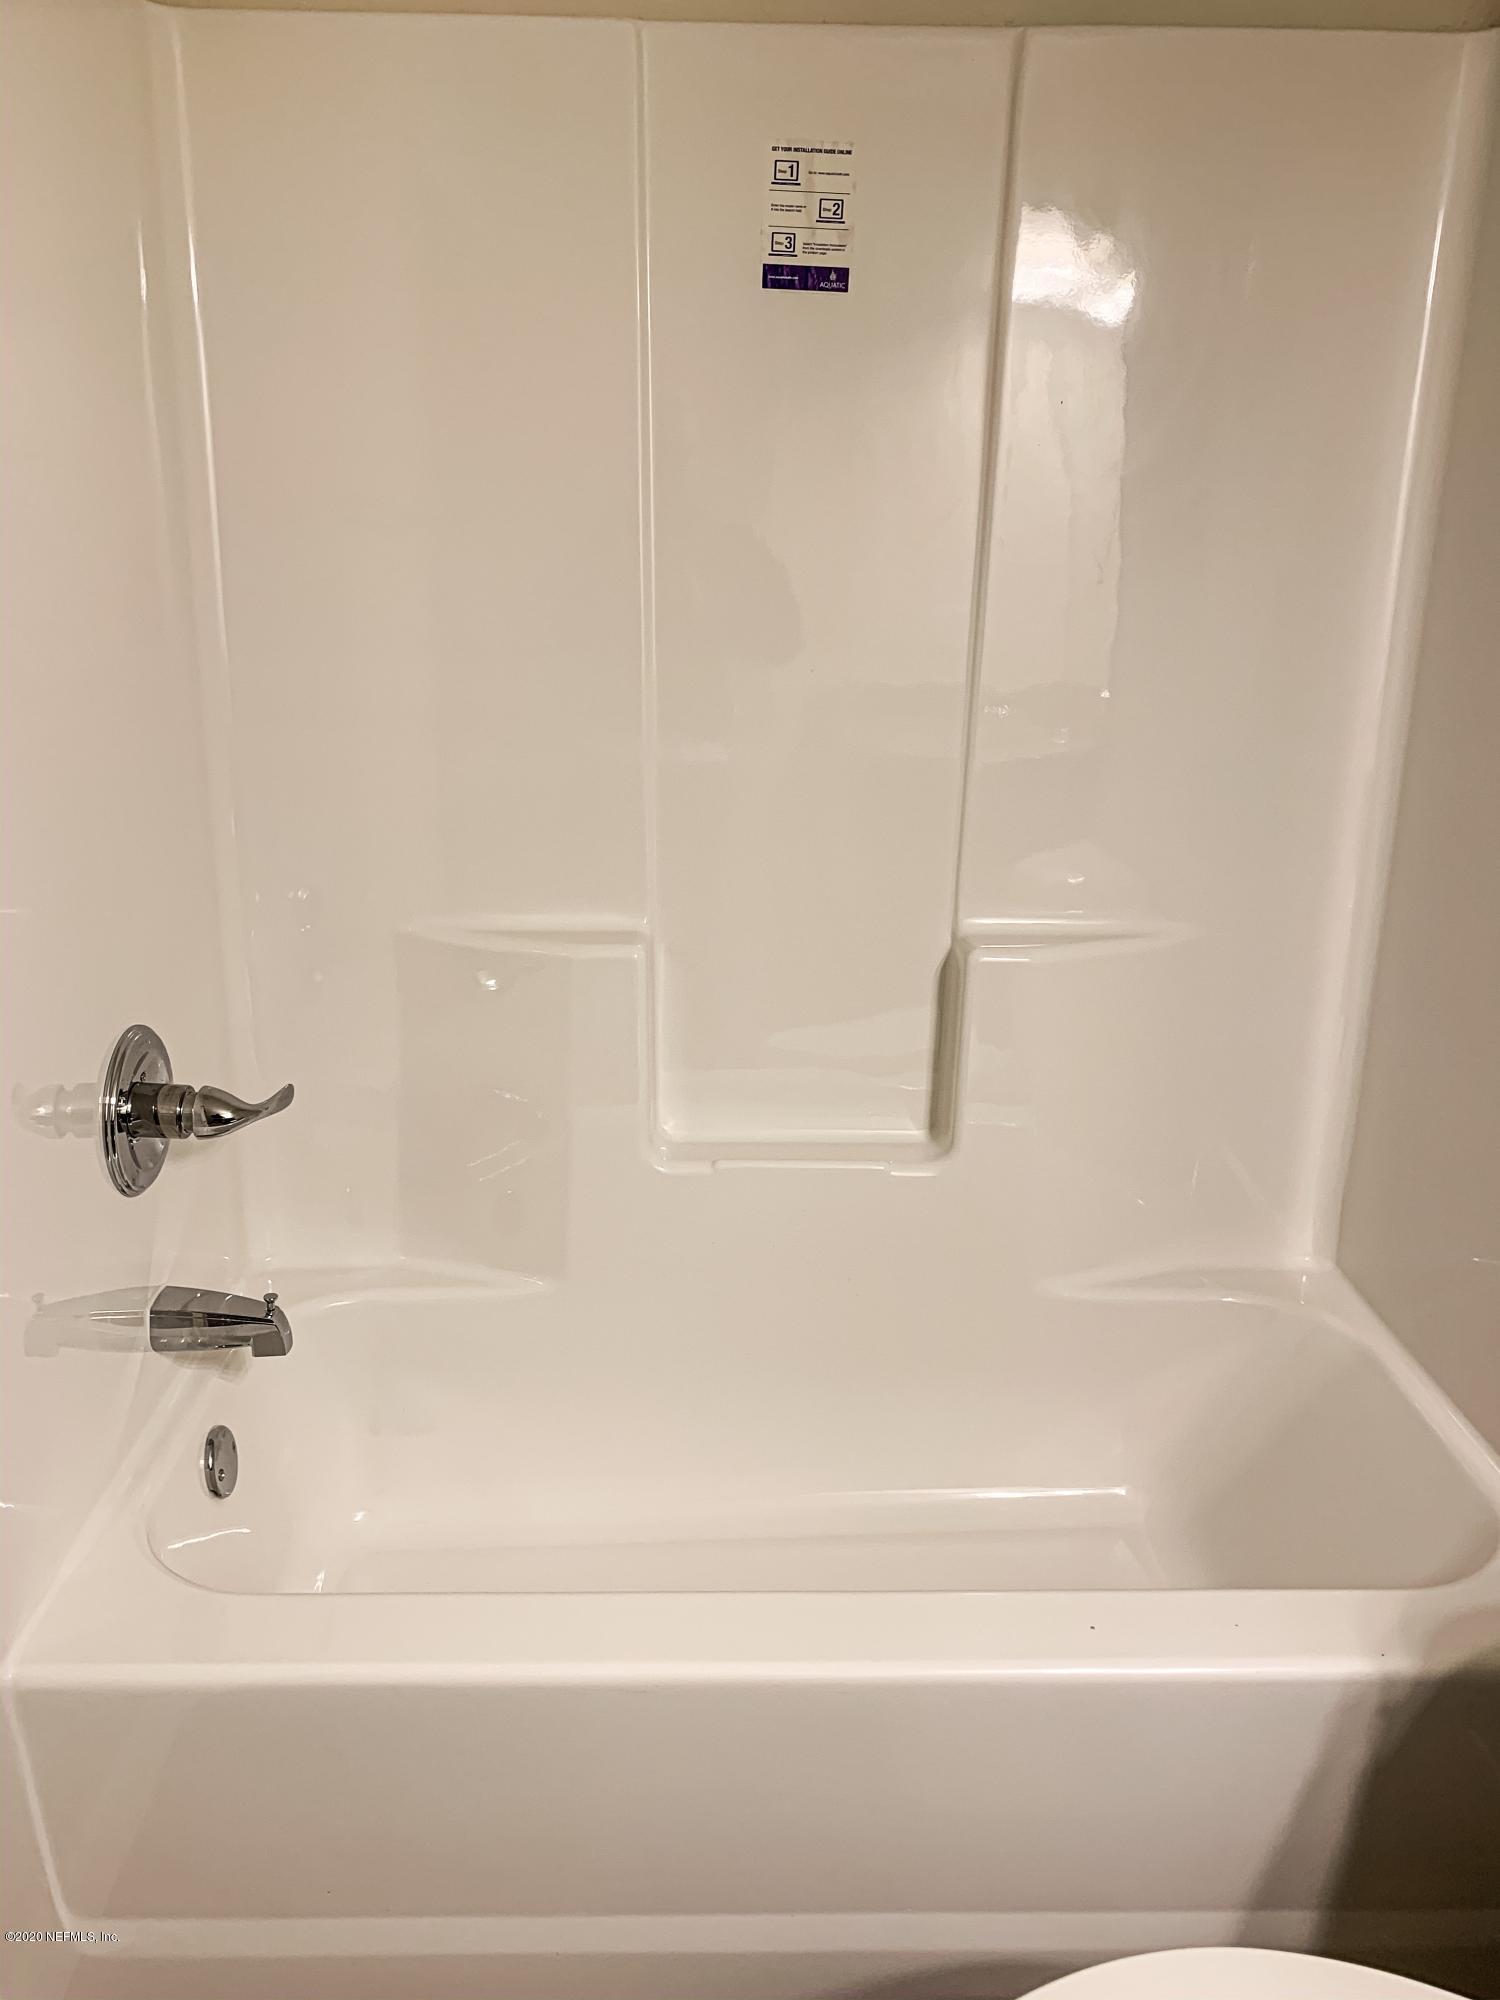 8096 JUNIPER, OCALA, FLORIDA 34480, 2 Bedrooms Bedrooms, ,2 BathroomsBathrooms,Rental,For Rent,JUNIPER,1038355